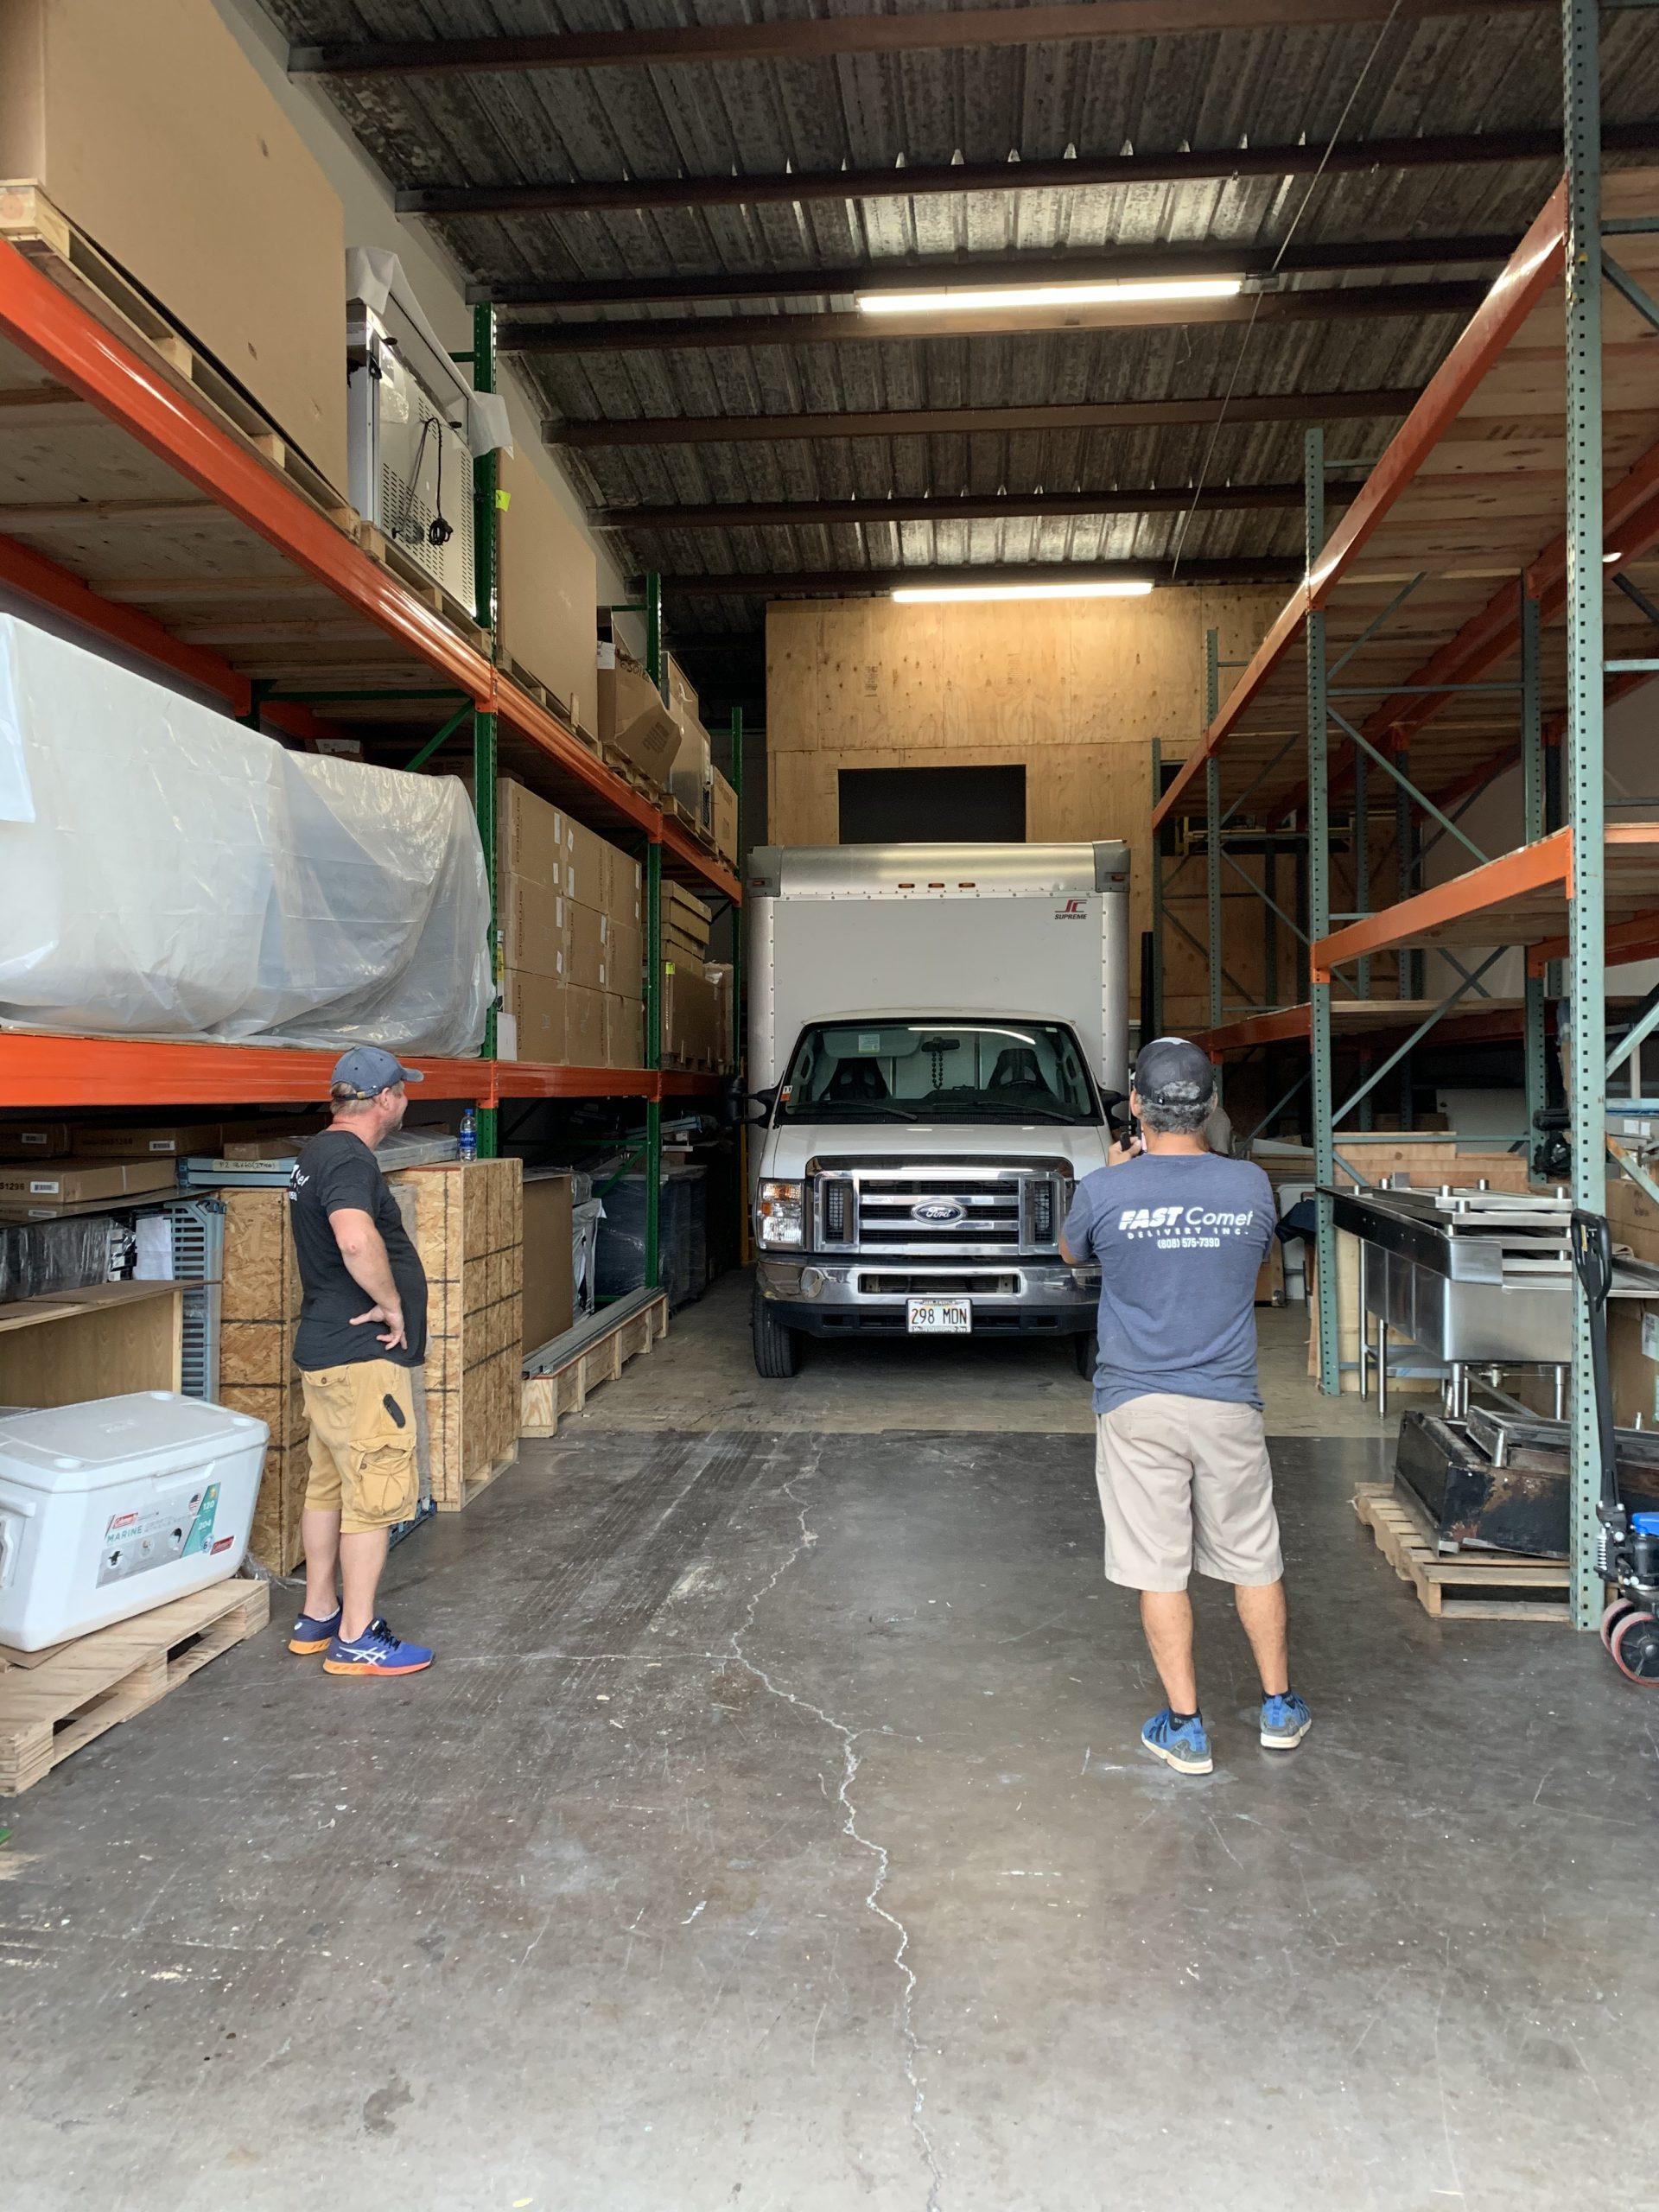 Fast Comet Warehouse 4 - Maui Hawaii - Movers